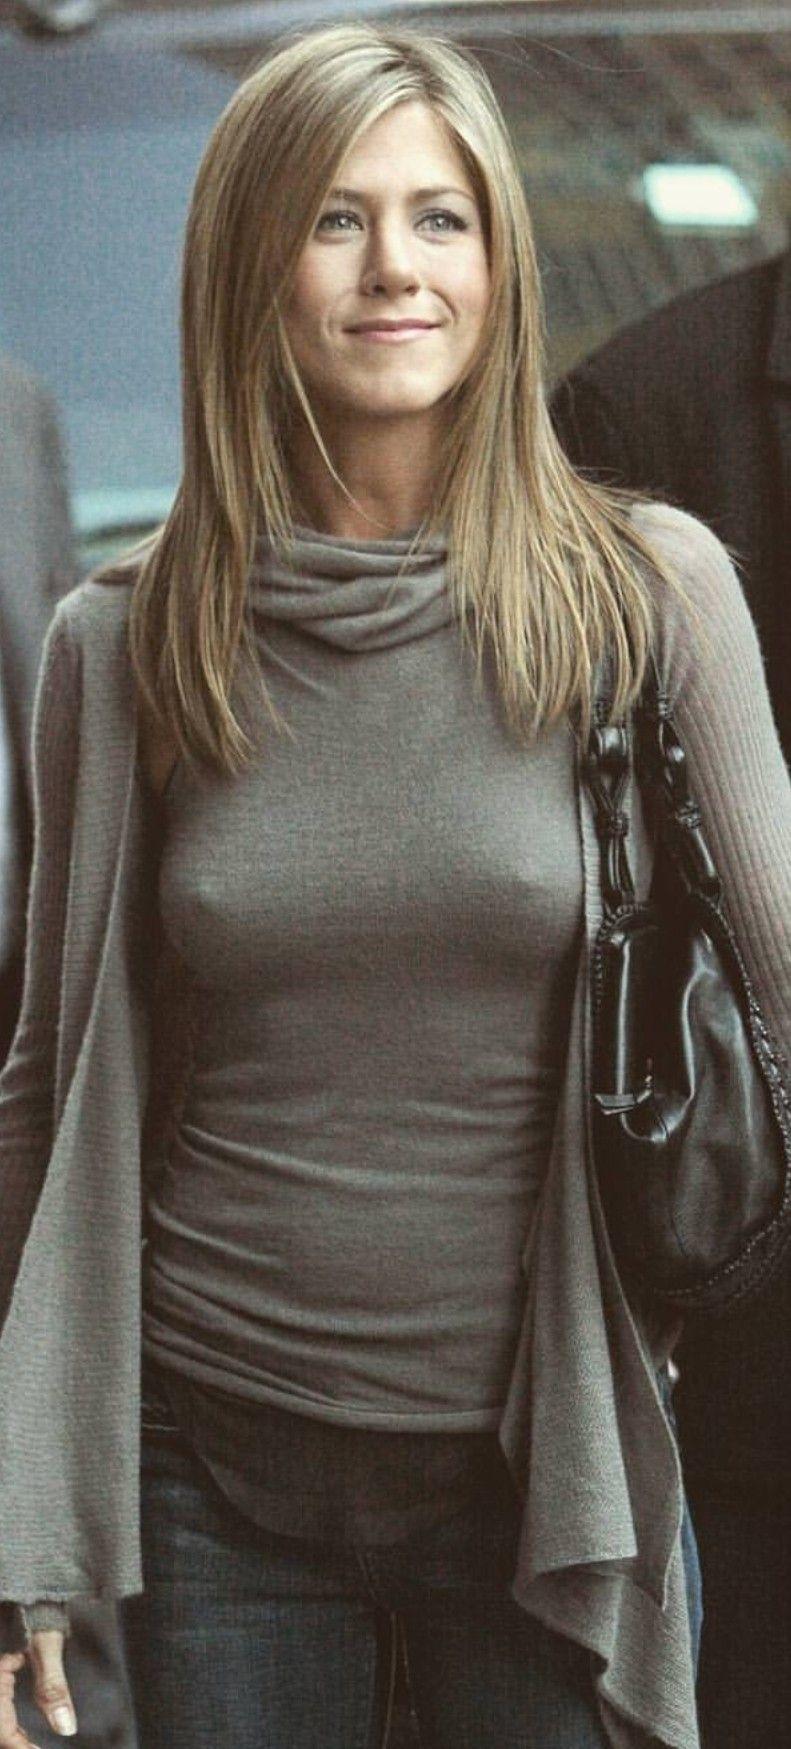 Дженнифер энистон без нижнего лифчика, секс в клубах донецка